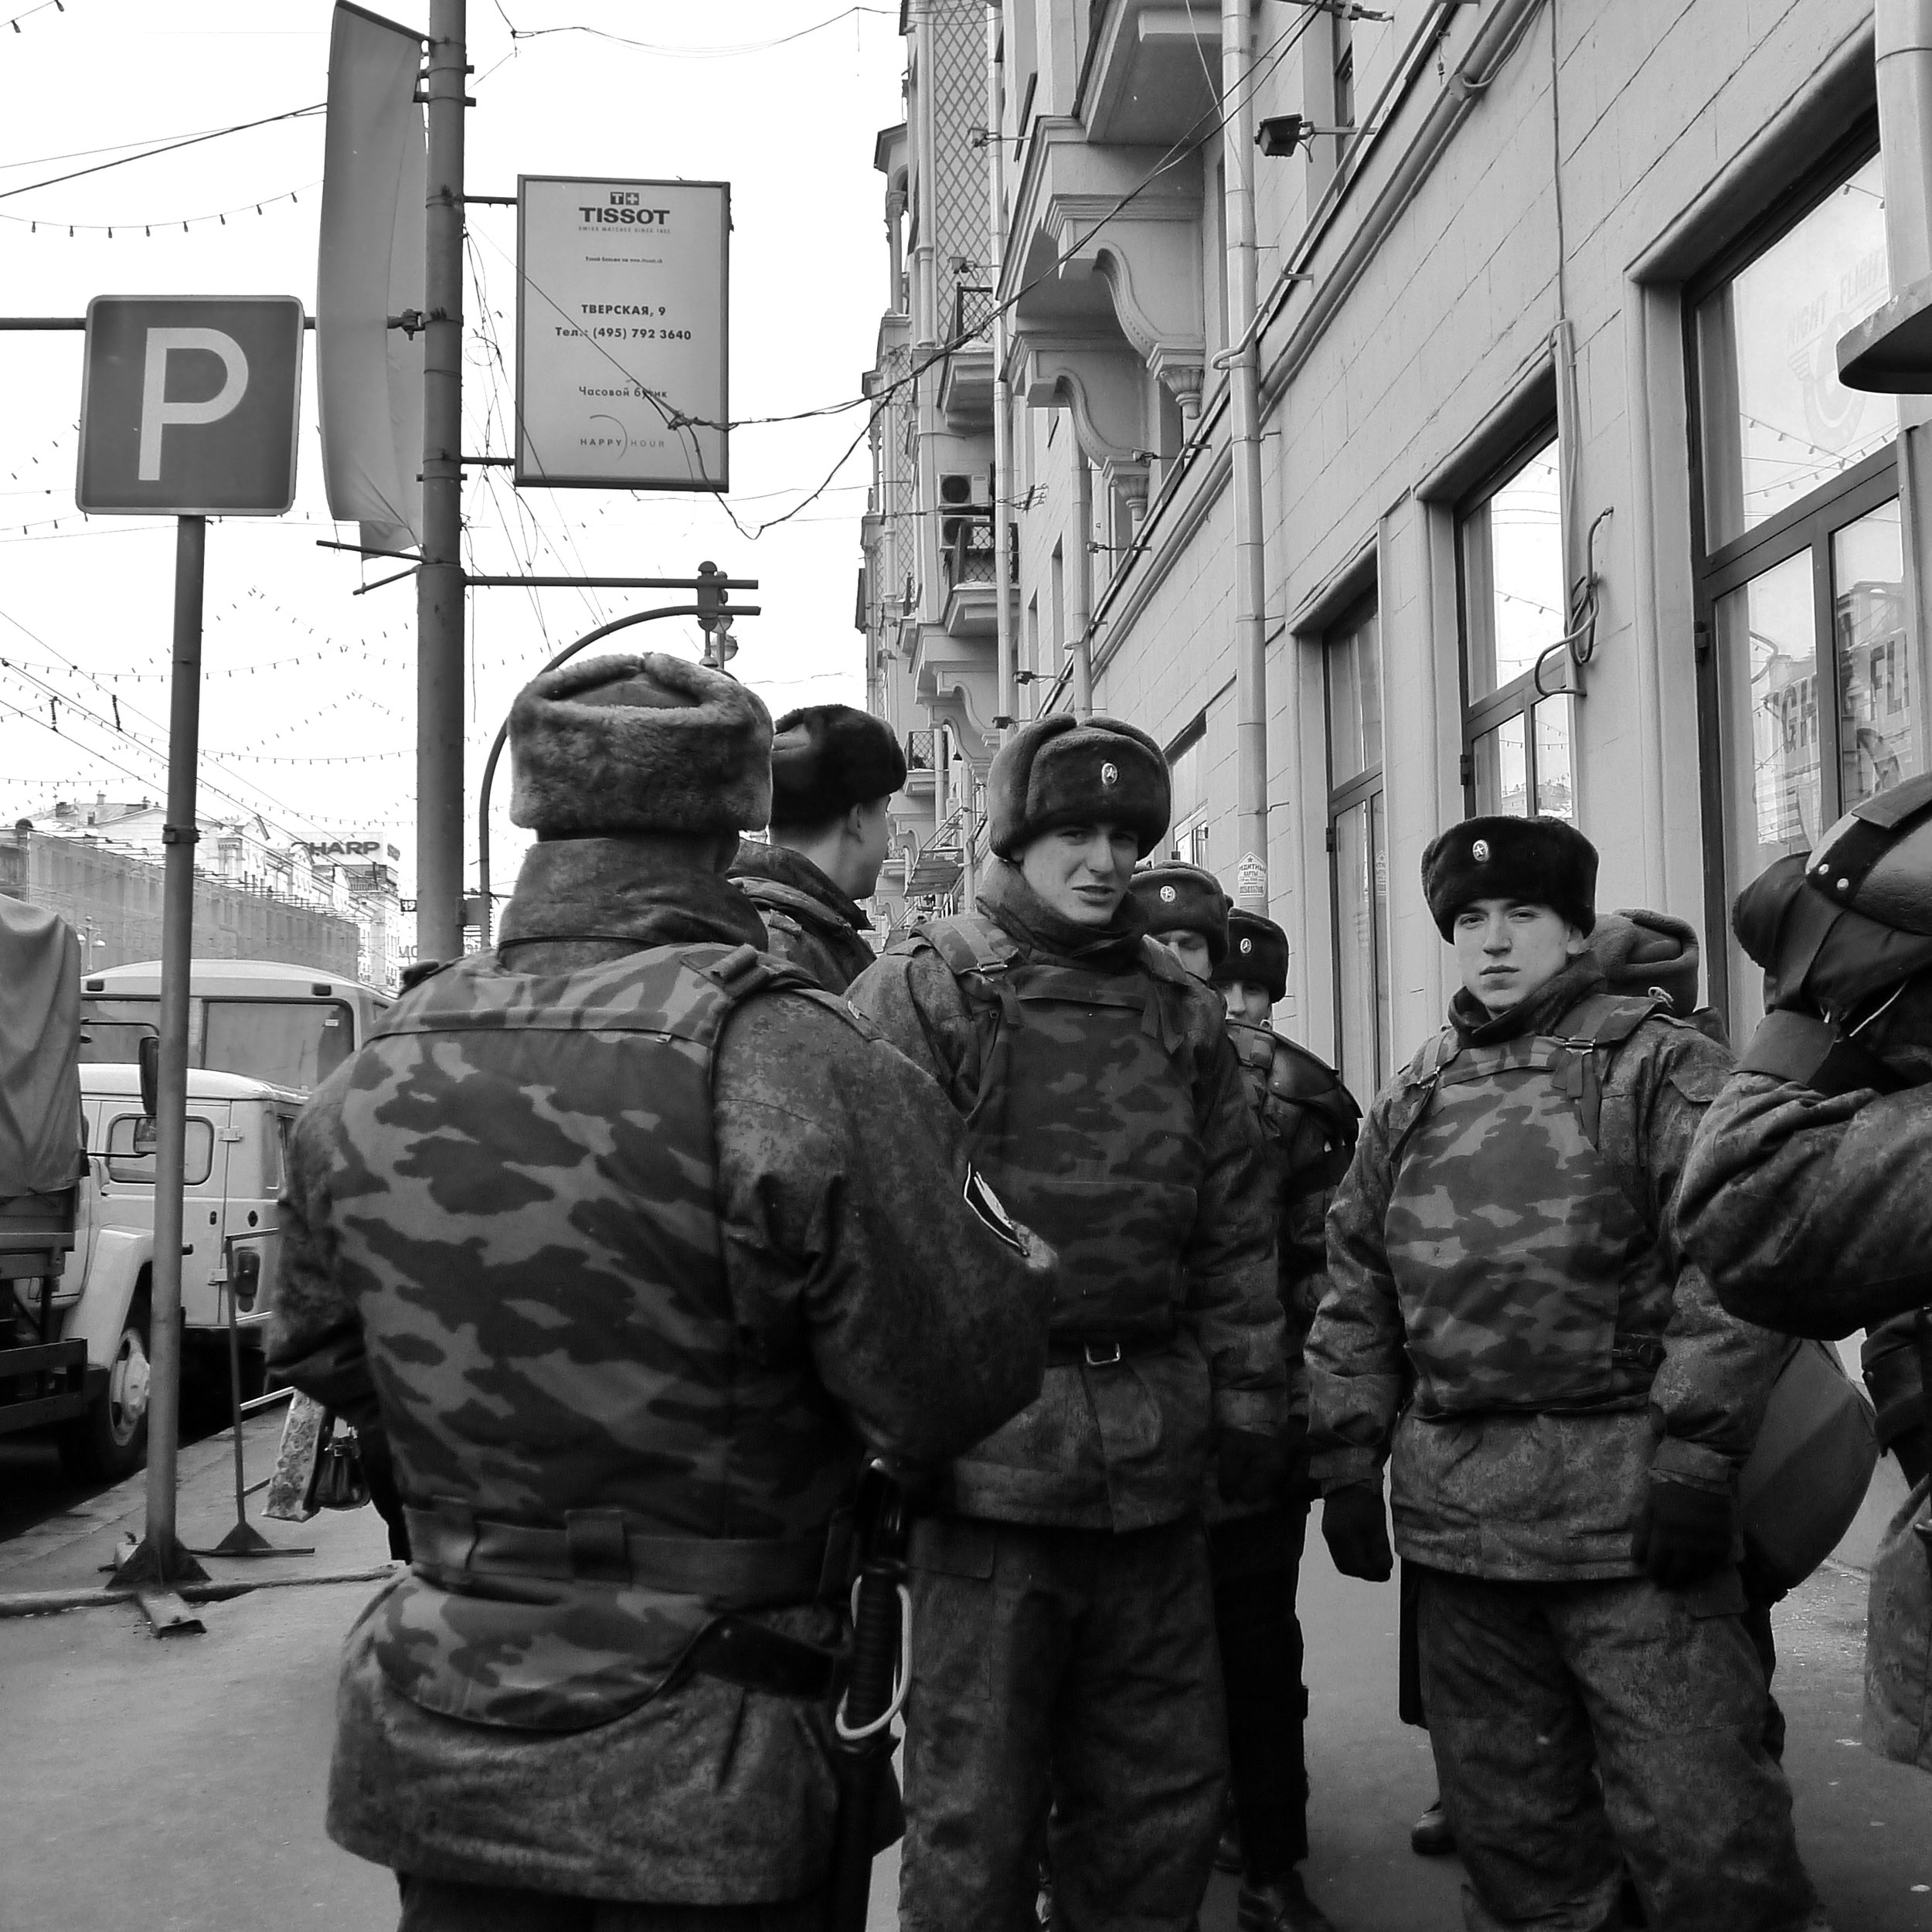 17_Untitled_Moscow_2012_medium-format.jpg